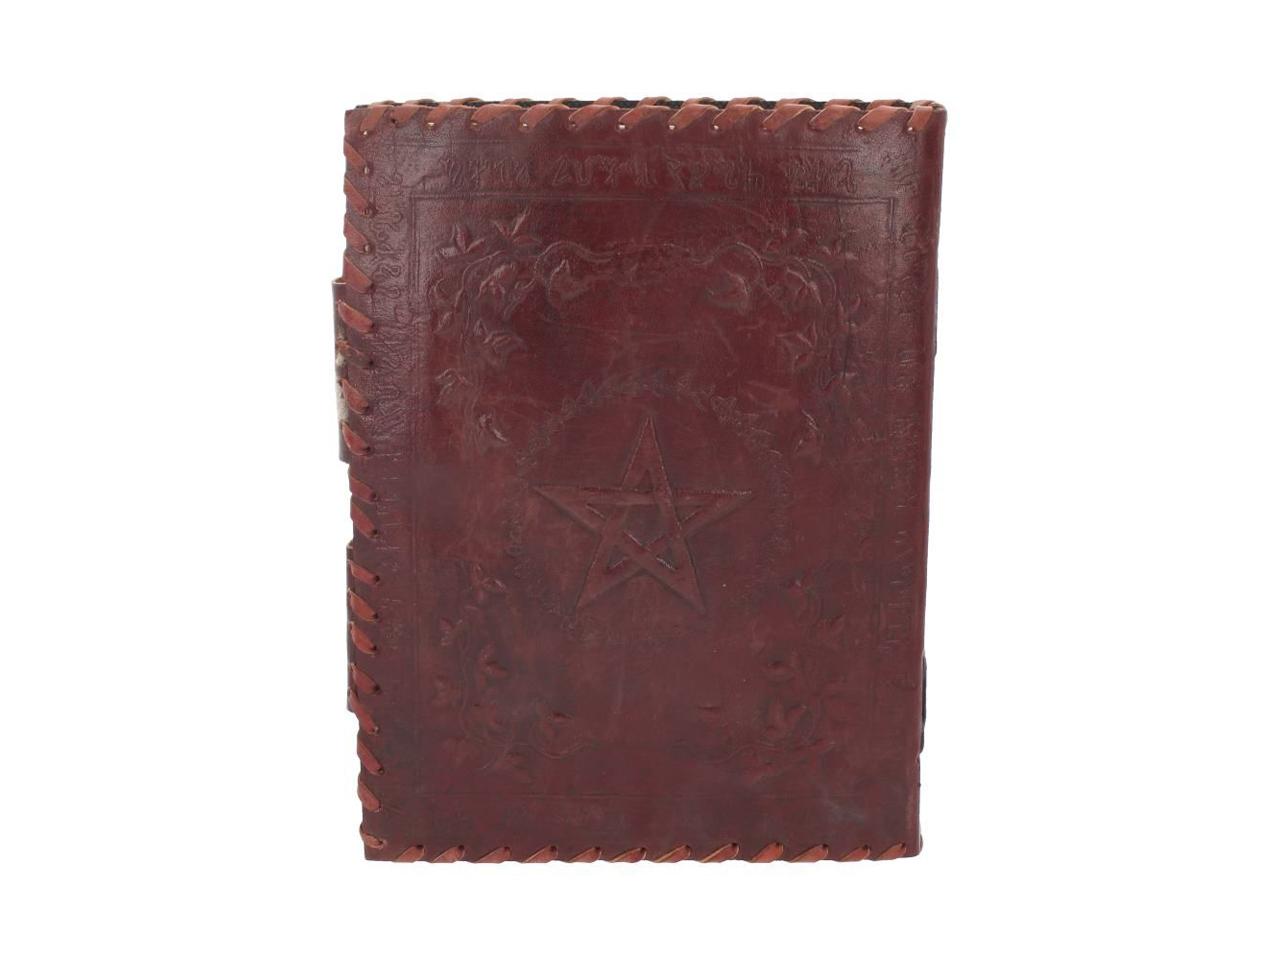 Book Of Shadow Leather Journal Note Book Plain Blank Paper Handmade Pentagram Celtic Magic Occult Pagan Spellbook Nemesis Now